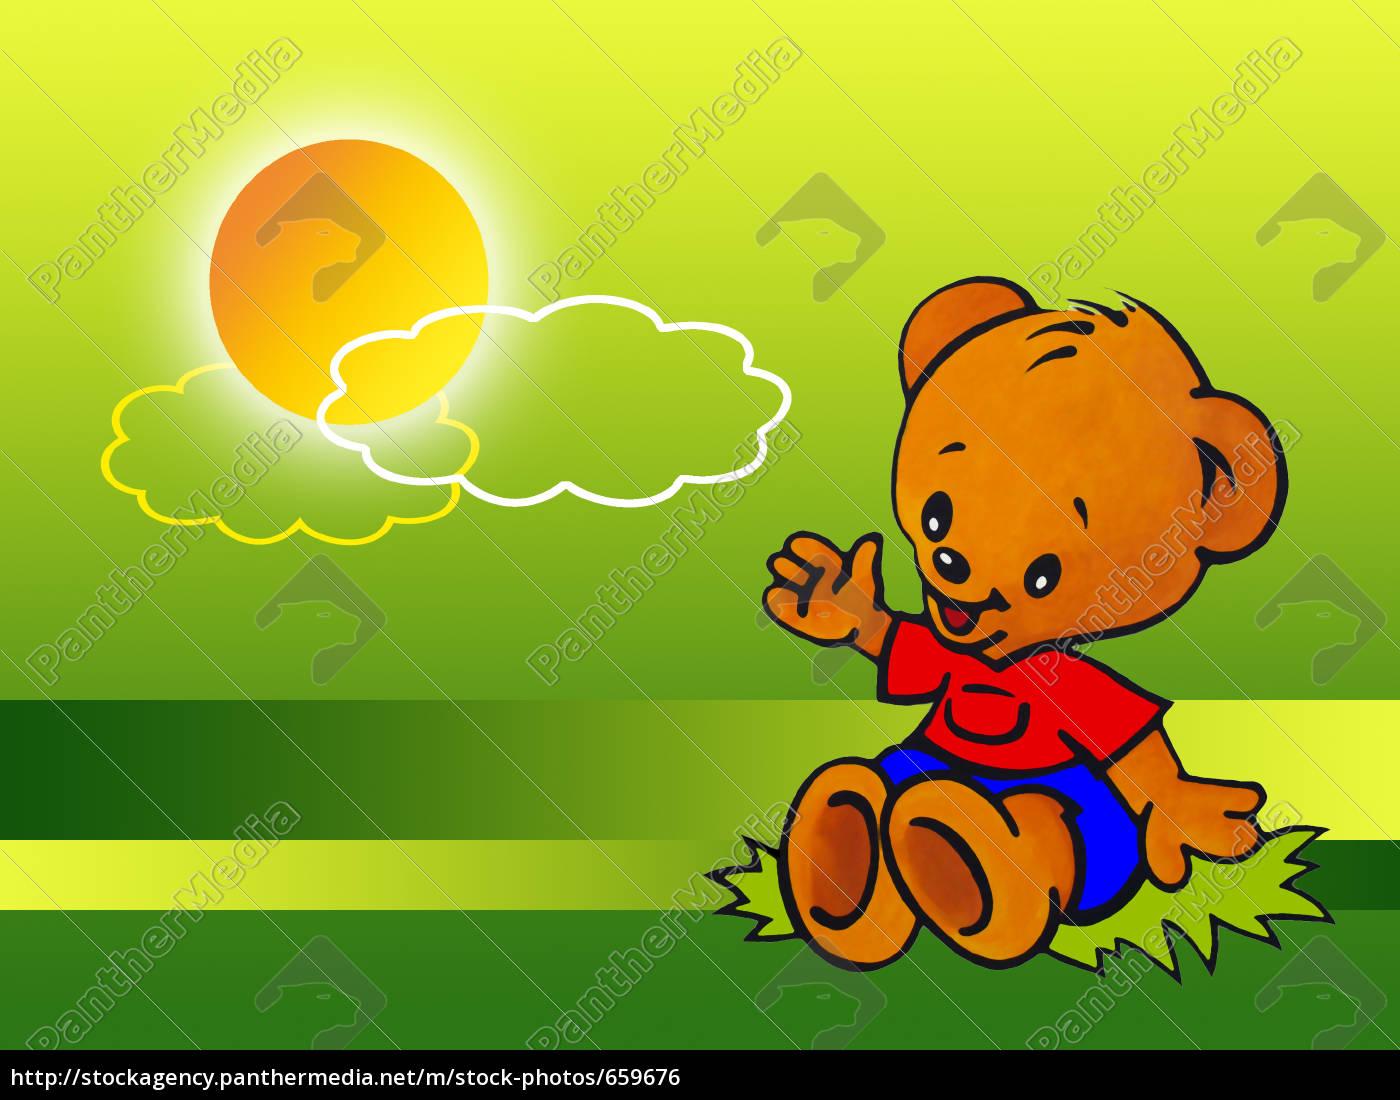 little, bear, greets, the, sun - 659676